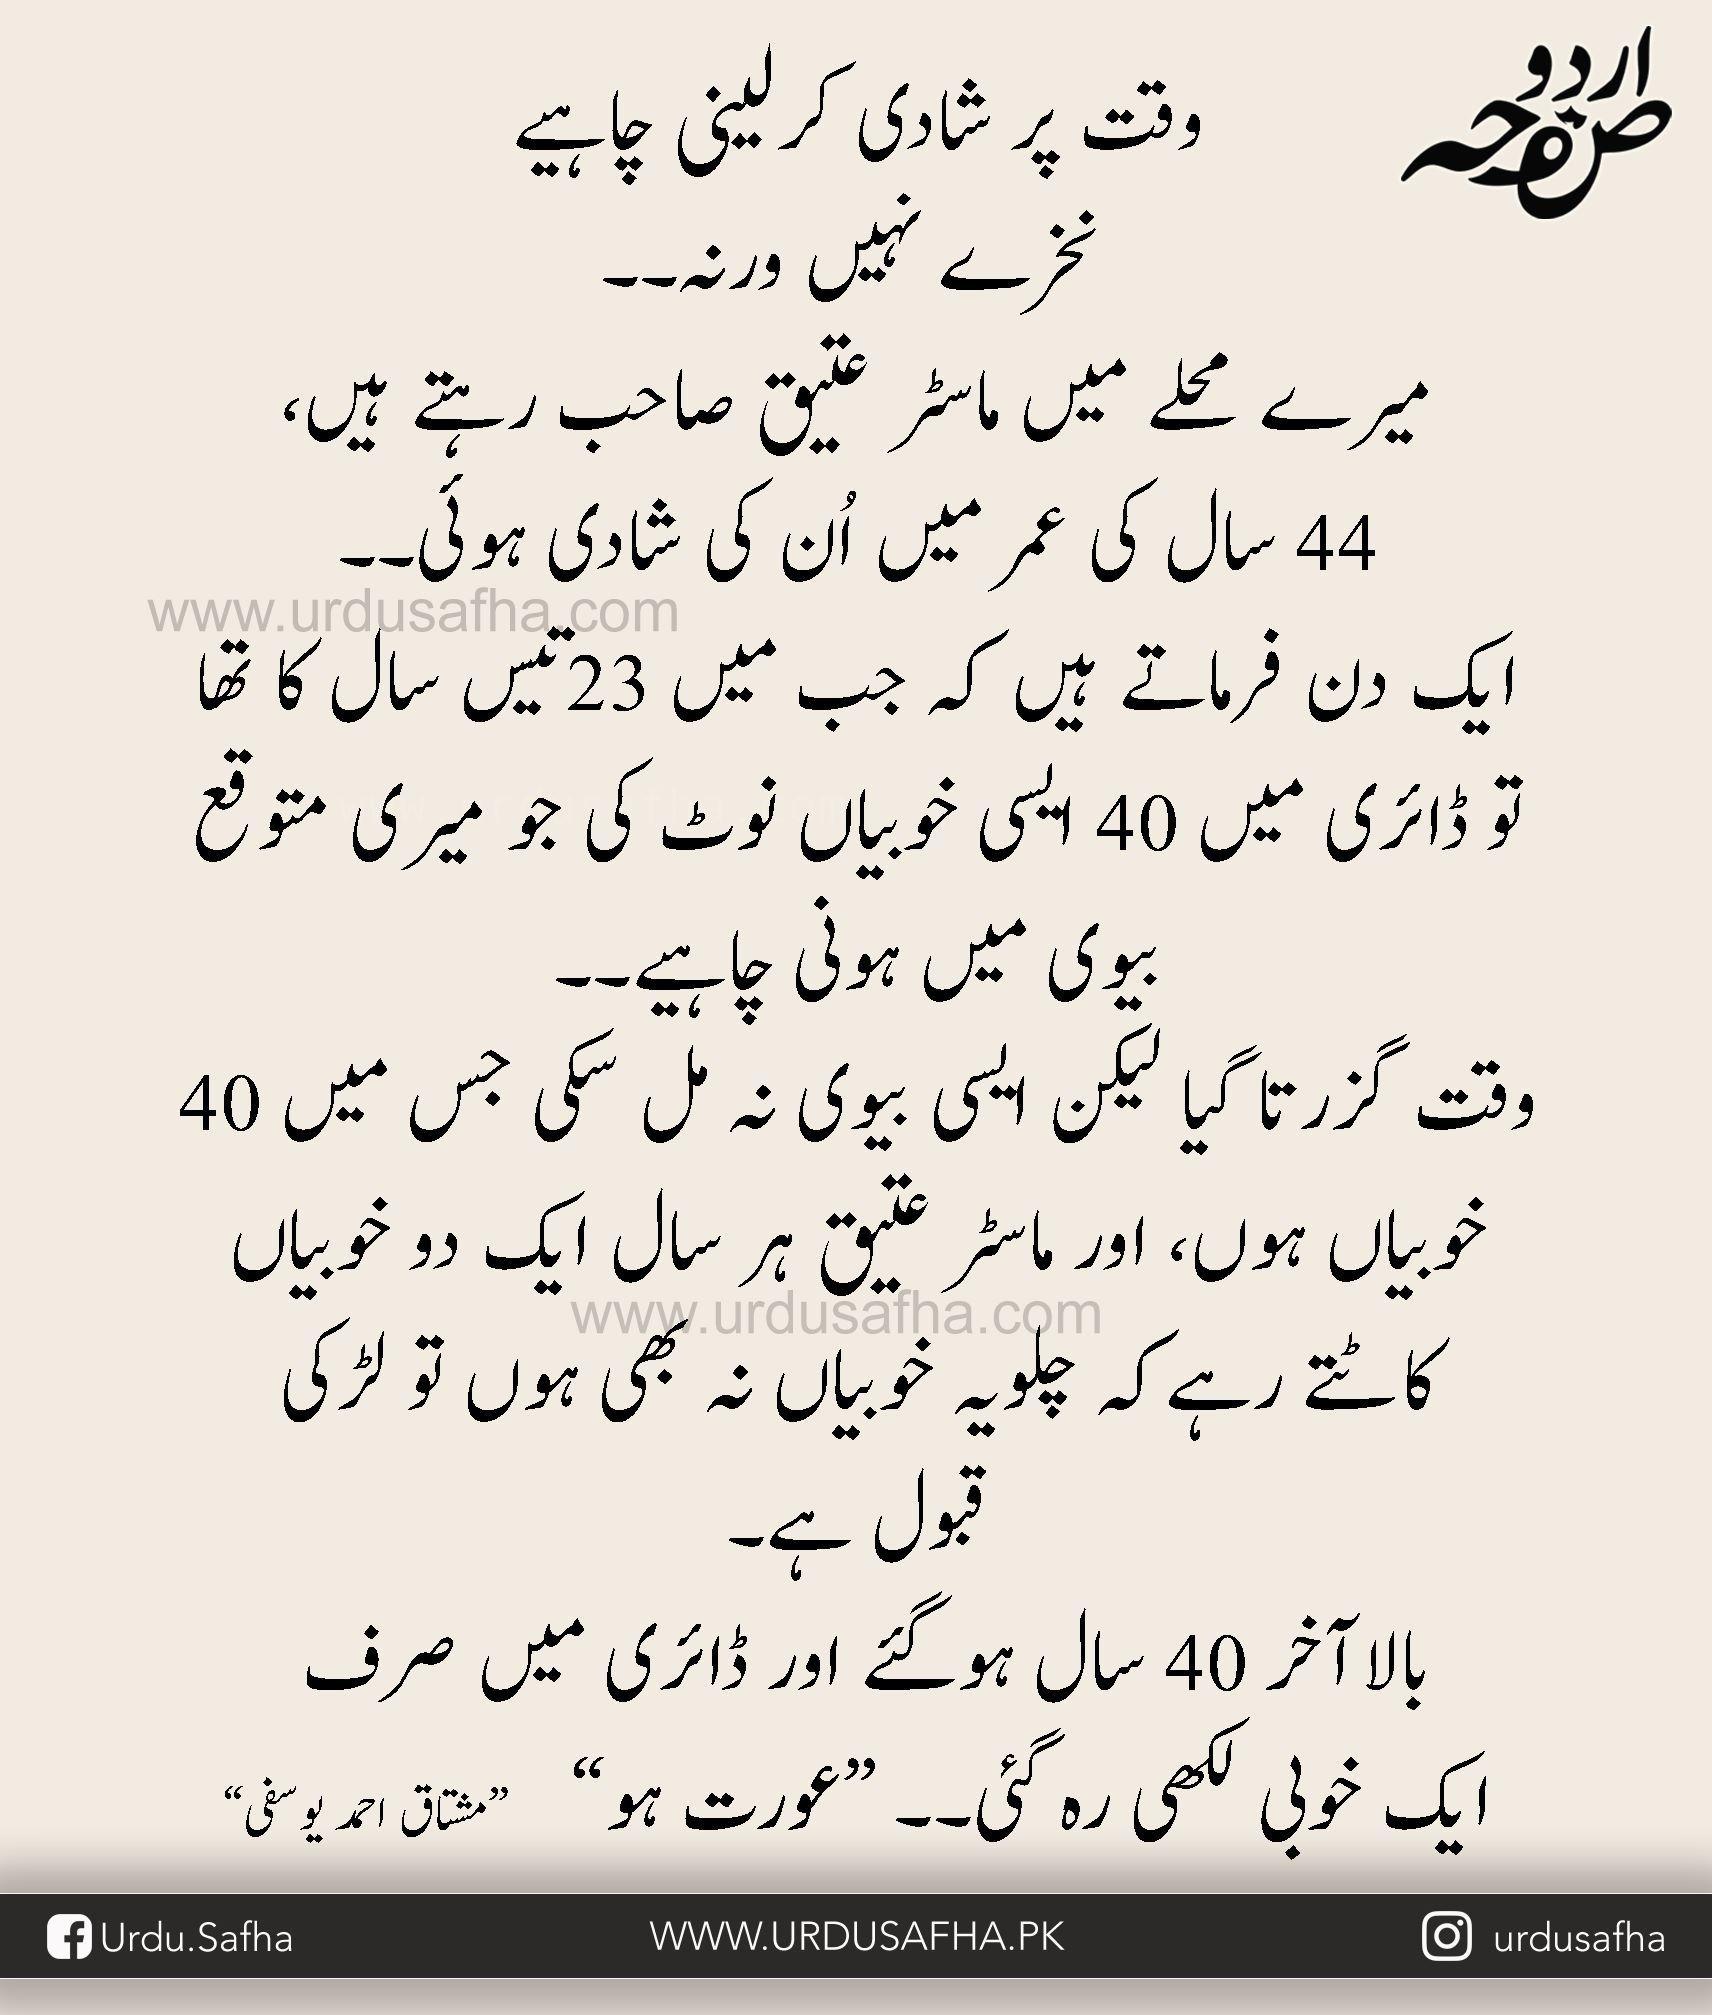 Pin By Khaliq Gujjar On Mazahiya Sabaq Funny Words Fun Quotes Funny Very Funny Jokes